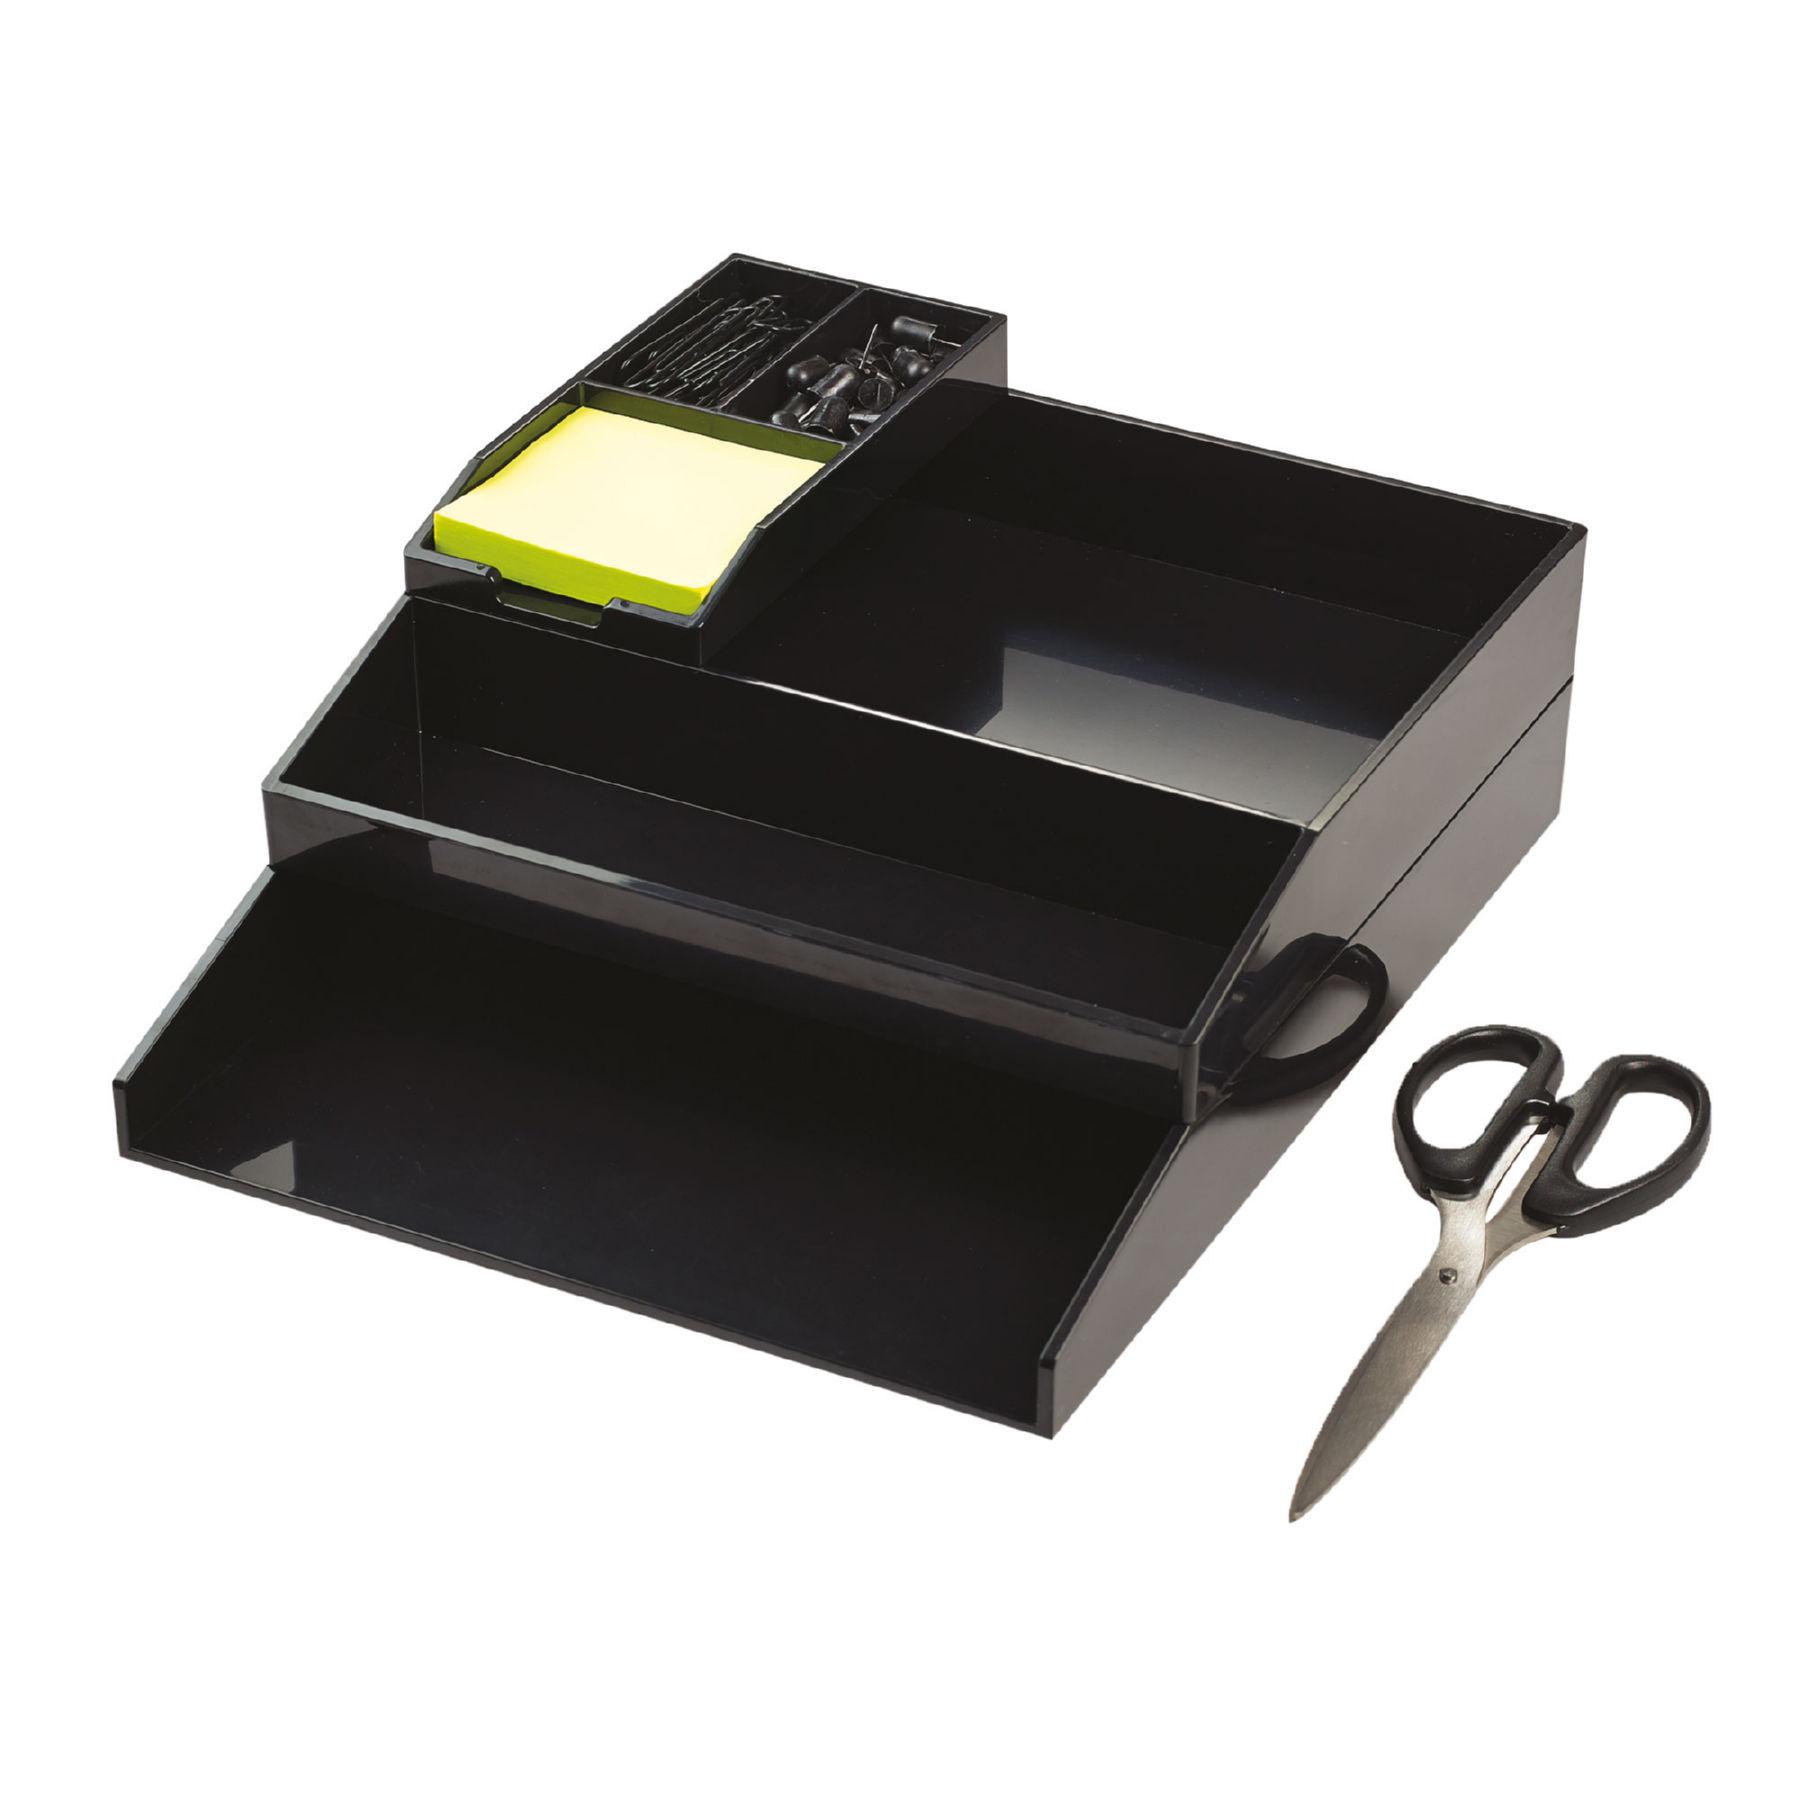 Avery ColorStak Office Desk Set Black